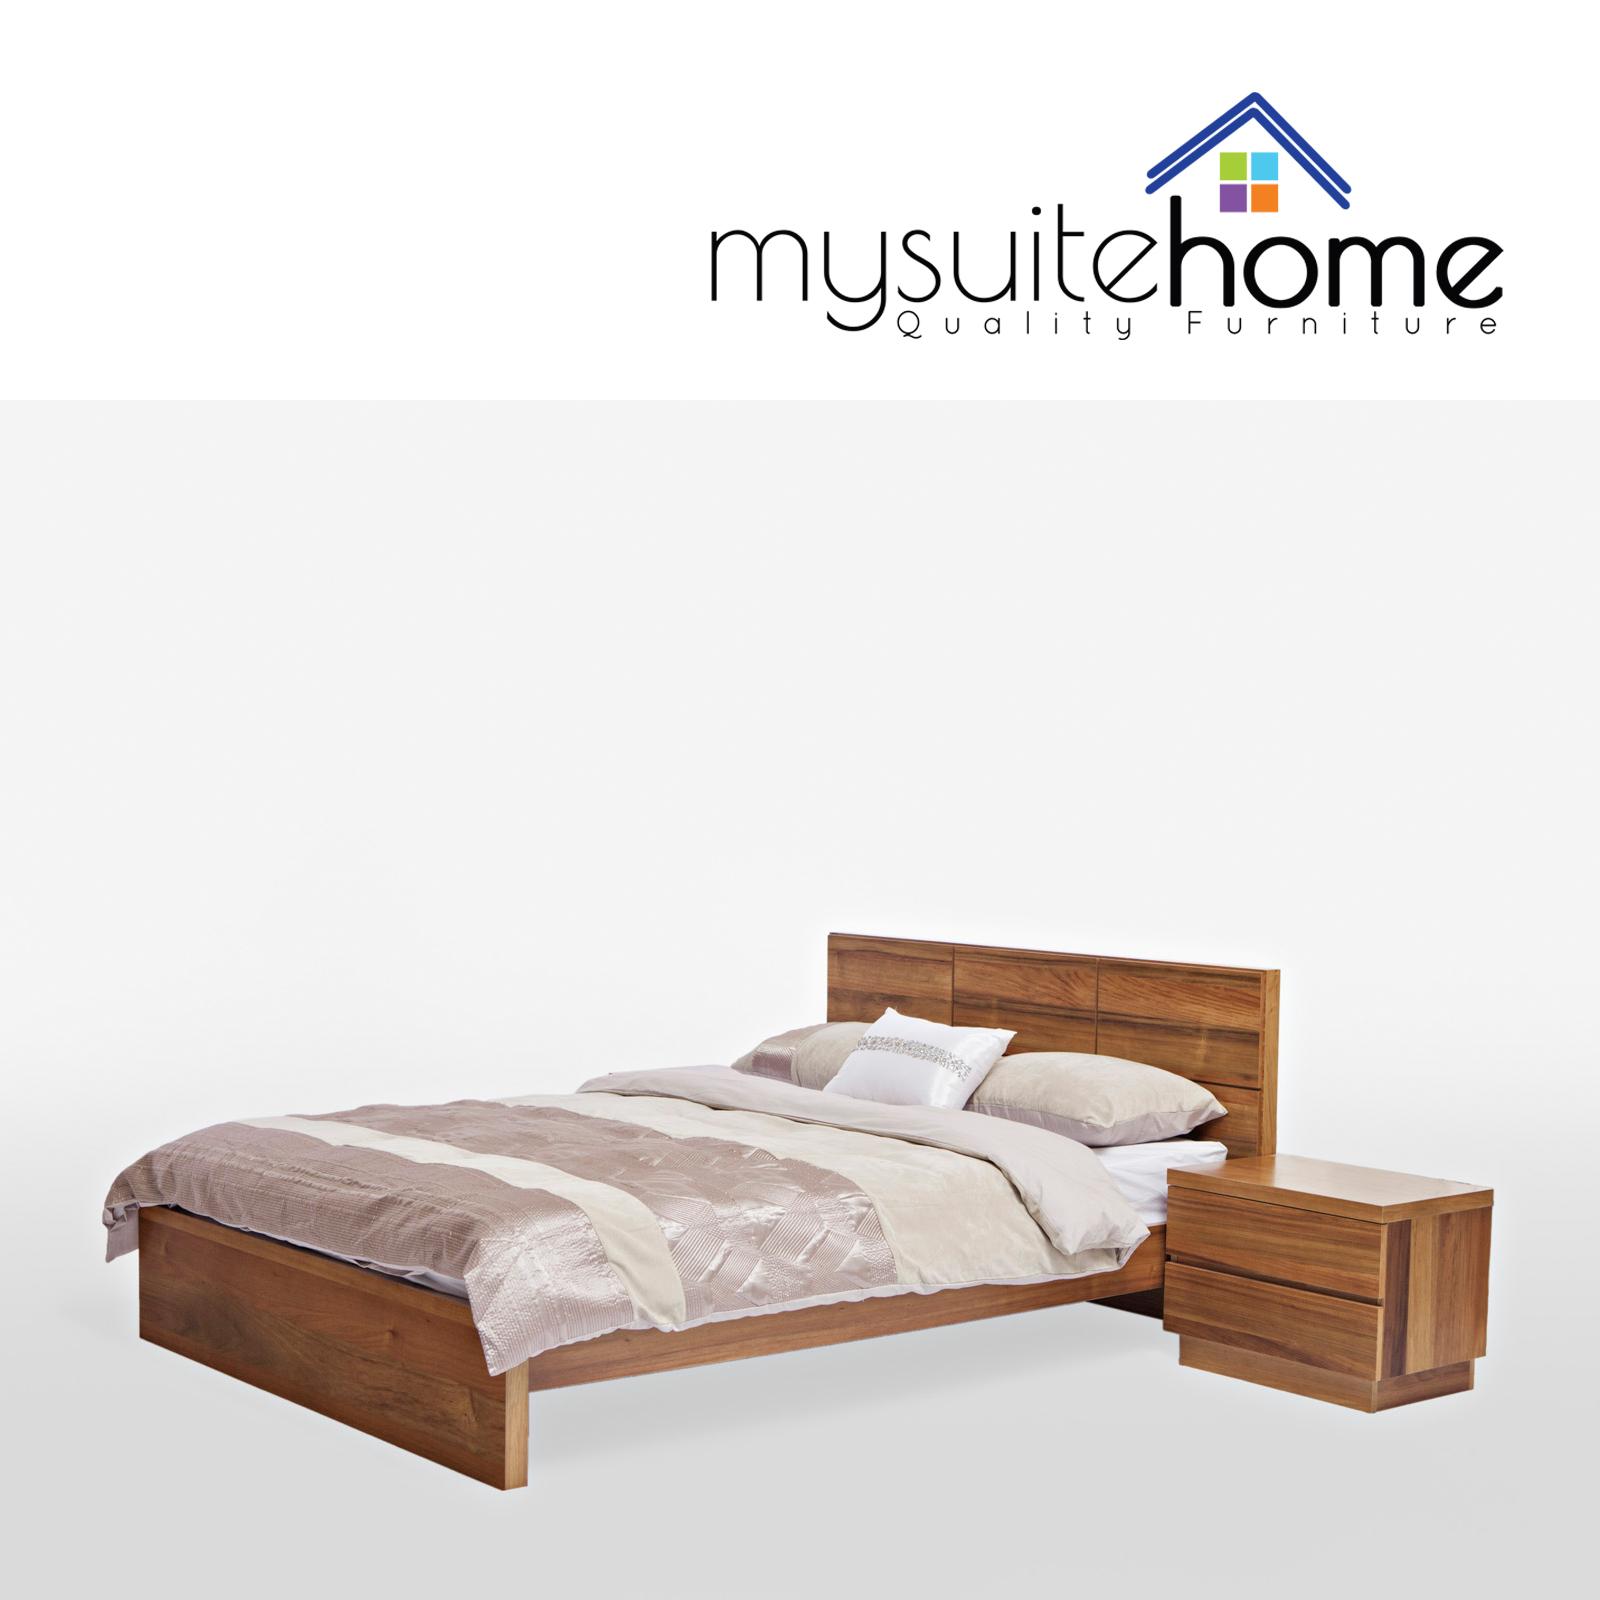 Florence Blackwood Timber Wood Veneer Size Bed Frame eBay : 10 0800814 from www.ebay.com.au size 1600 x 1600 jpeg 685kB